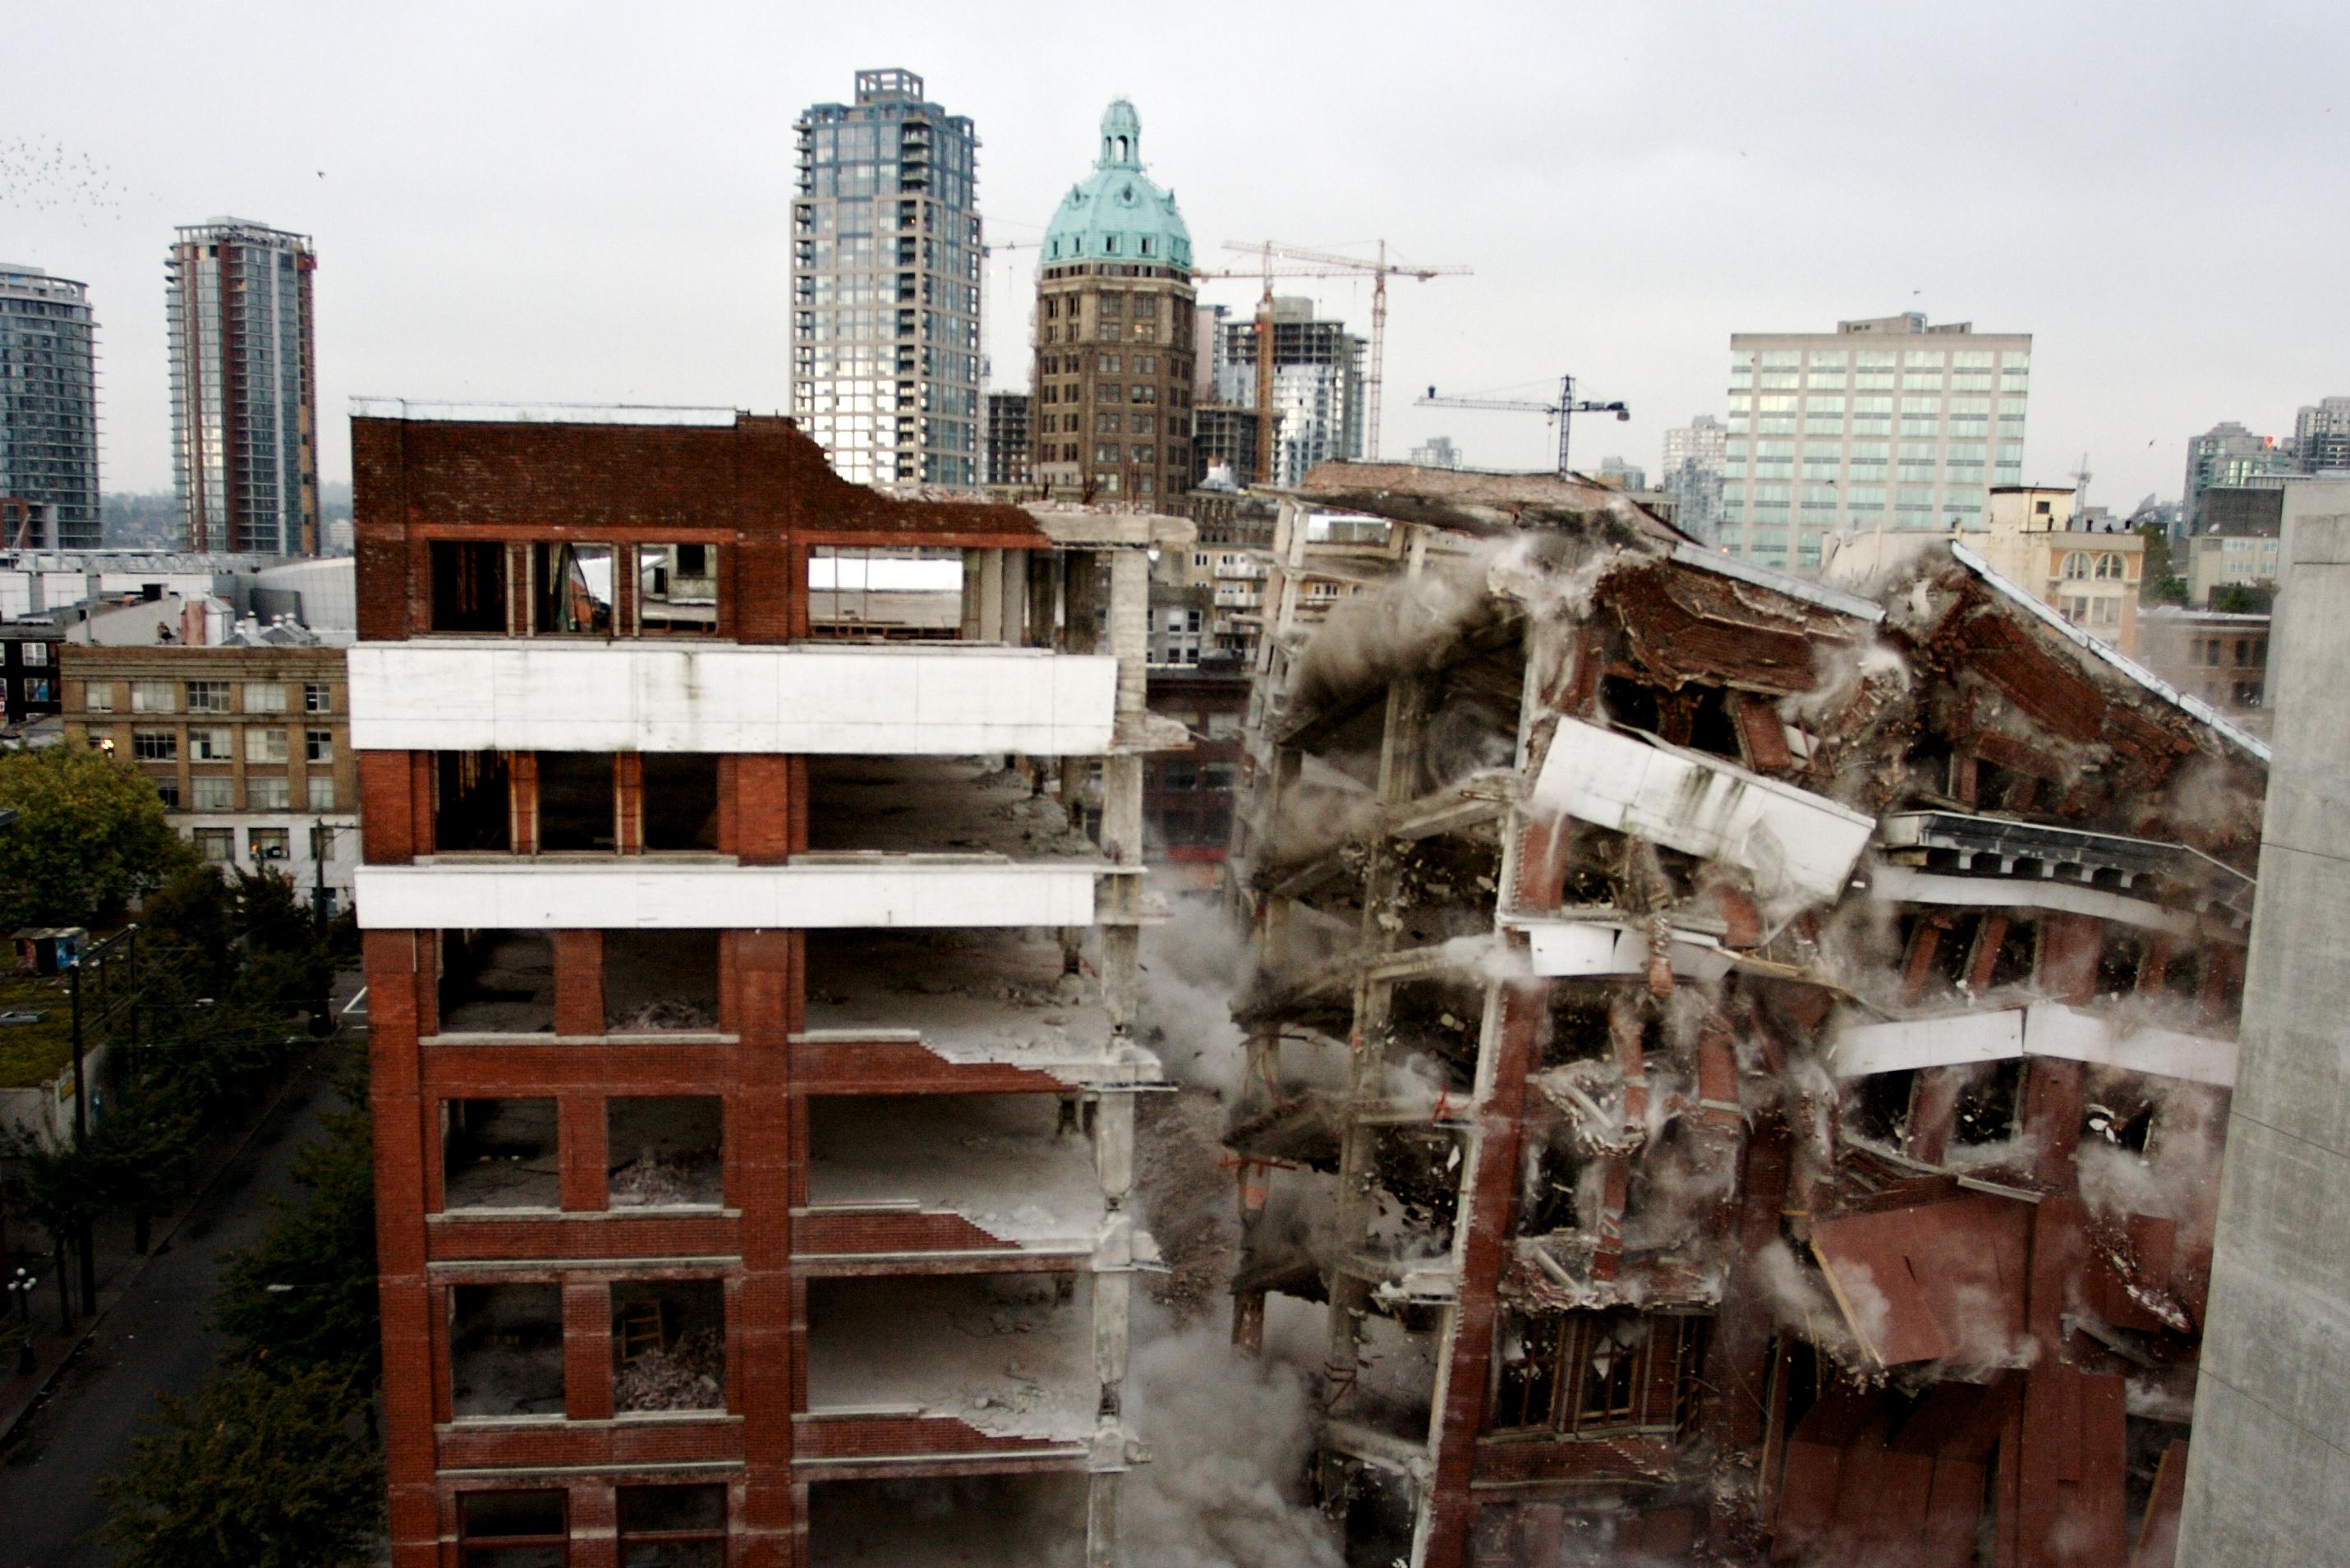 Building Demolition With Explosives : File woodwards building vancouver demolition g